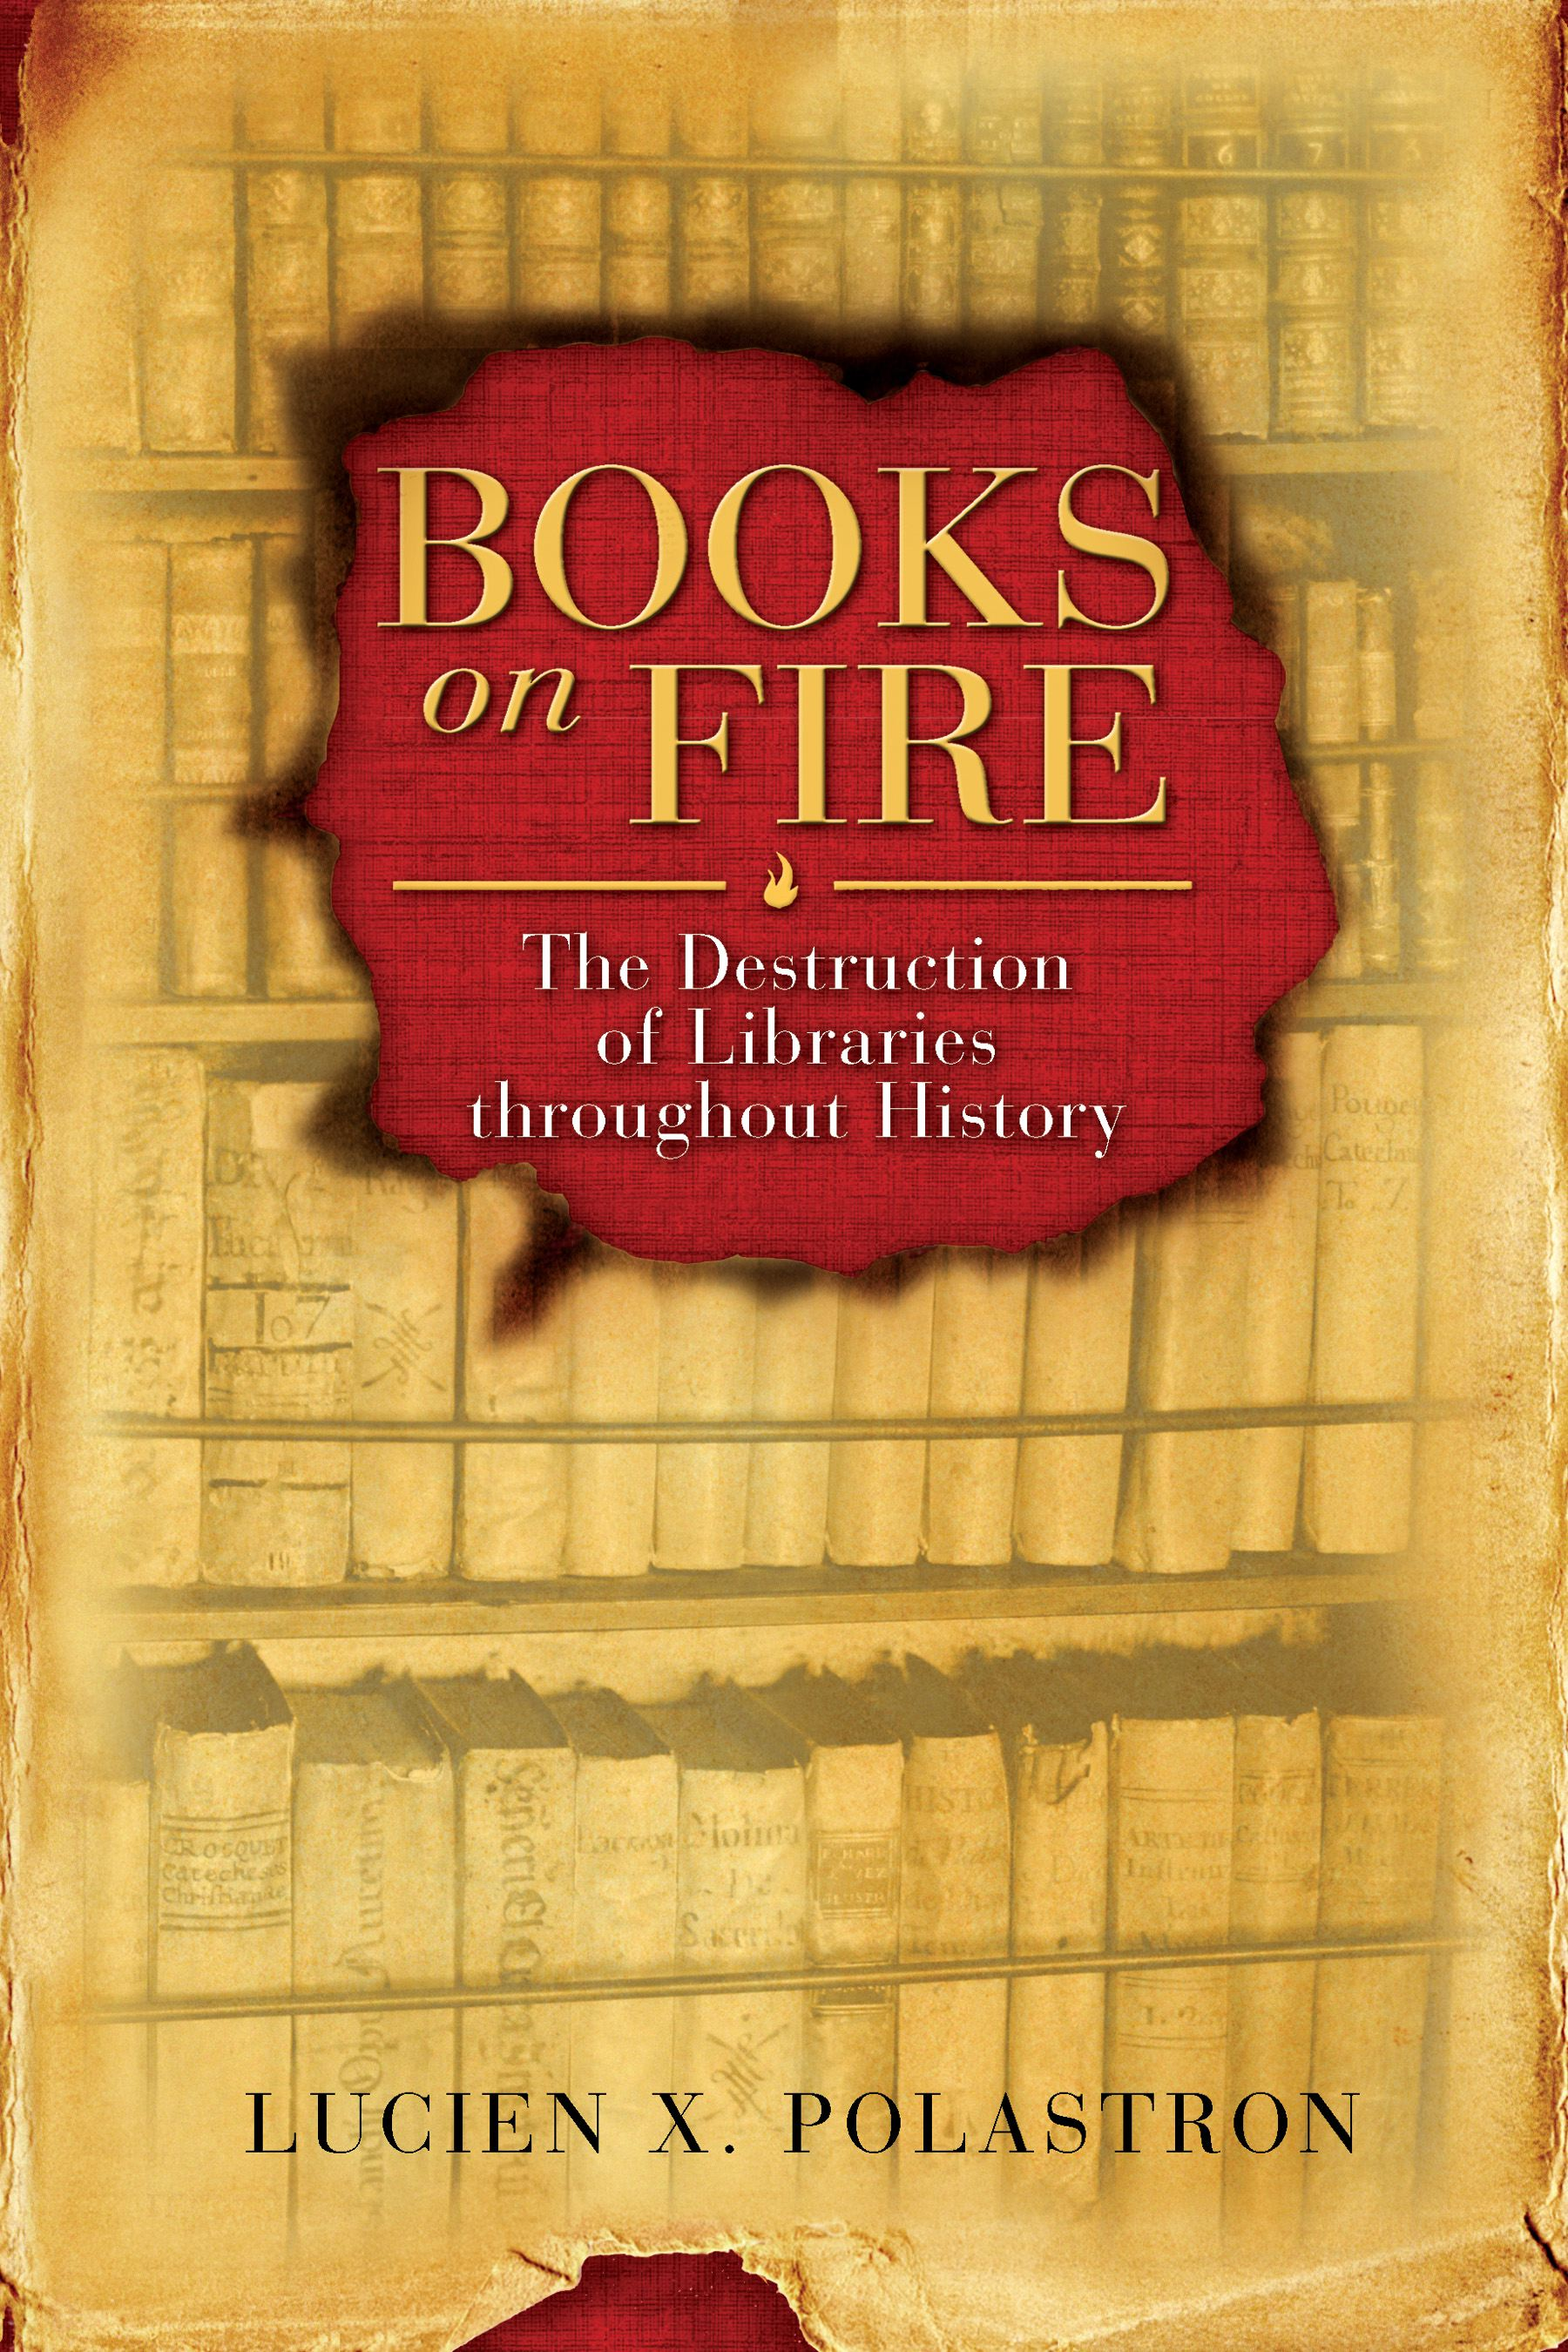 Books on fire 9781594771675 hr